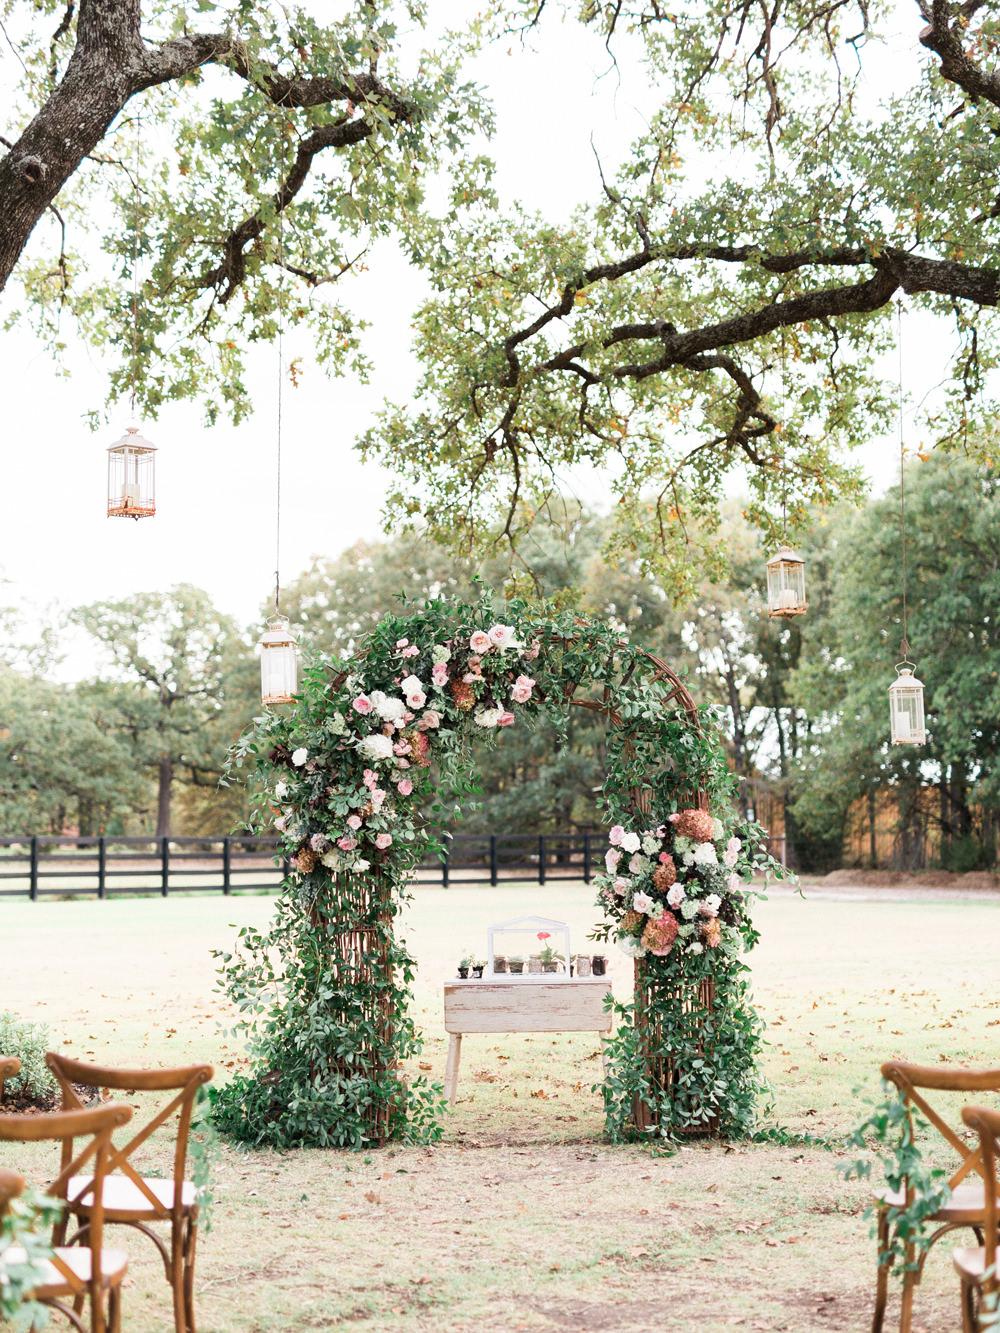 ceremony decor - photo by Elisabeth Carol Photography http://ruffledblog.com/picturesque-garden-wedding-at-white-sparrow-barn